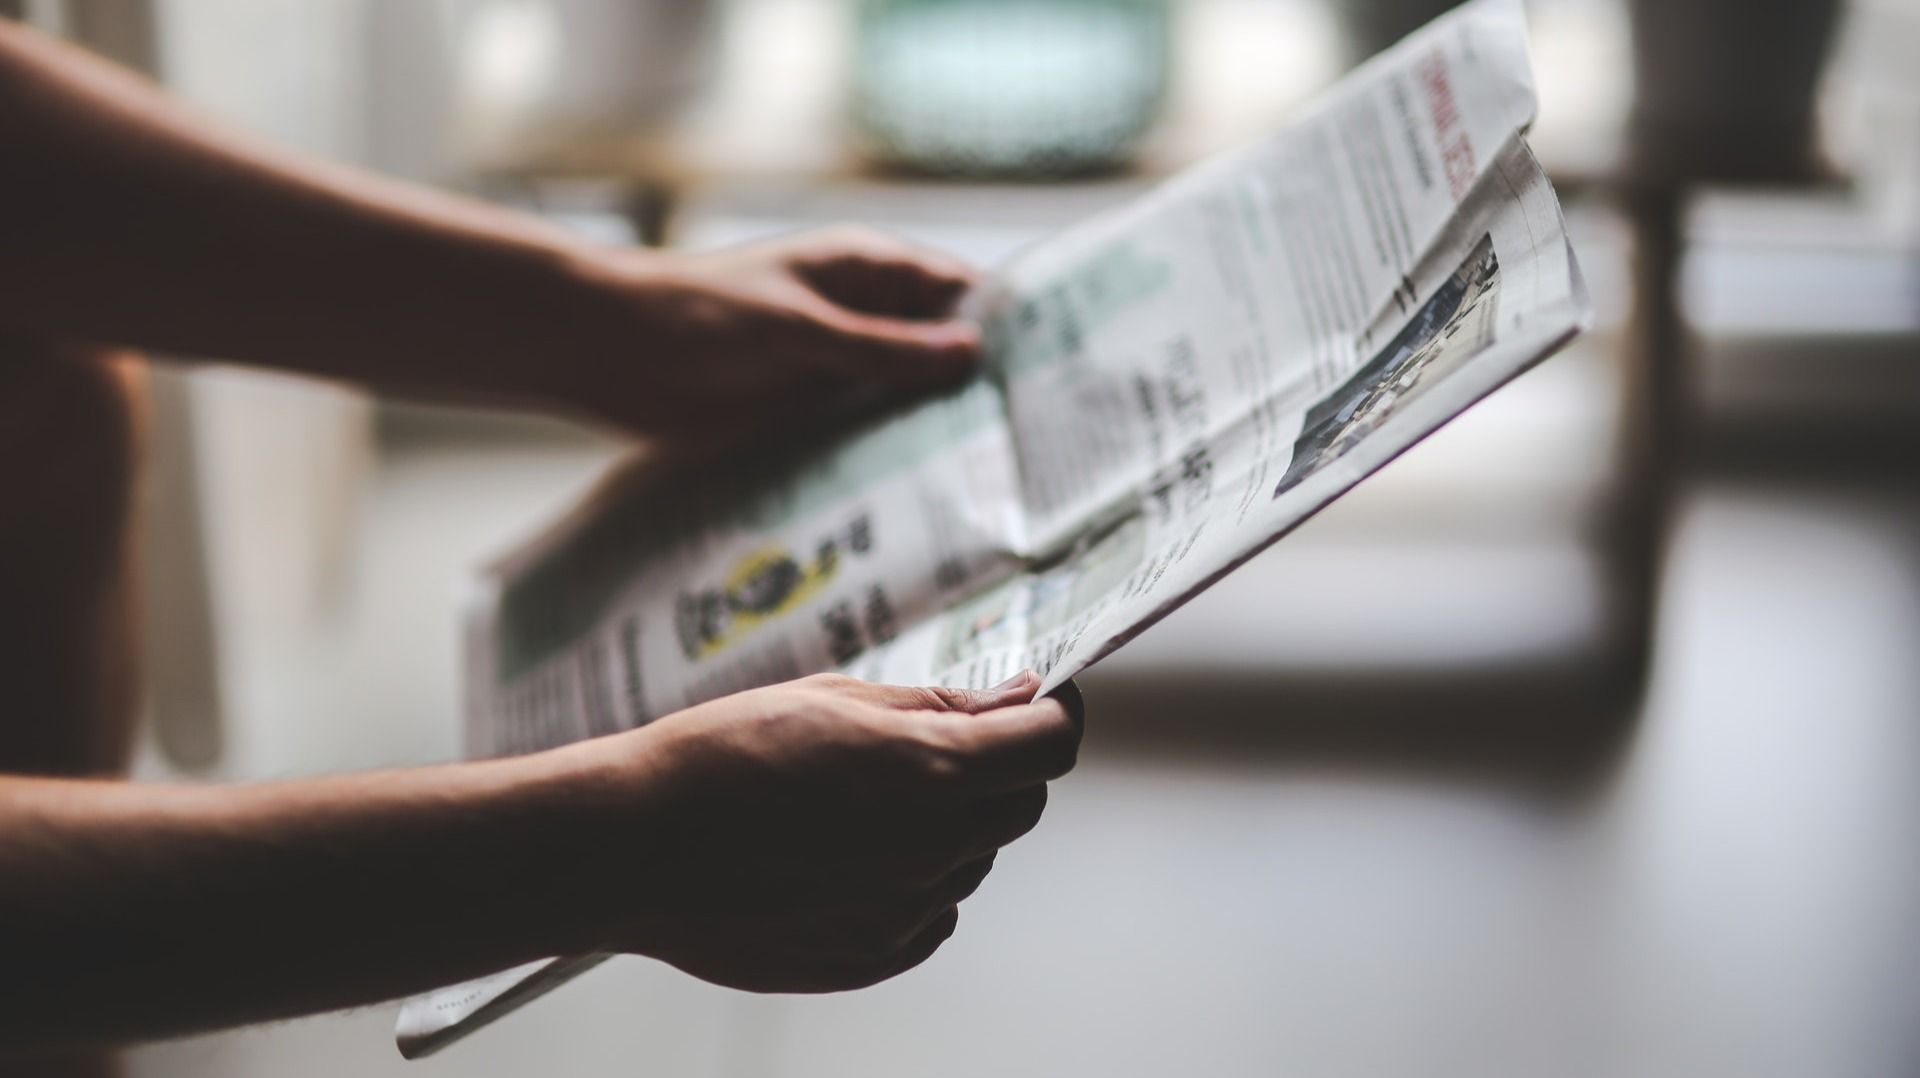 https://www.pexels.com/photo/man-reading-newspaper-6053/